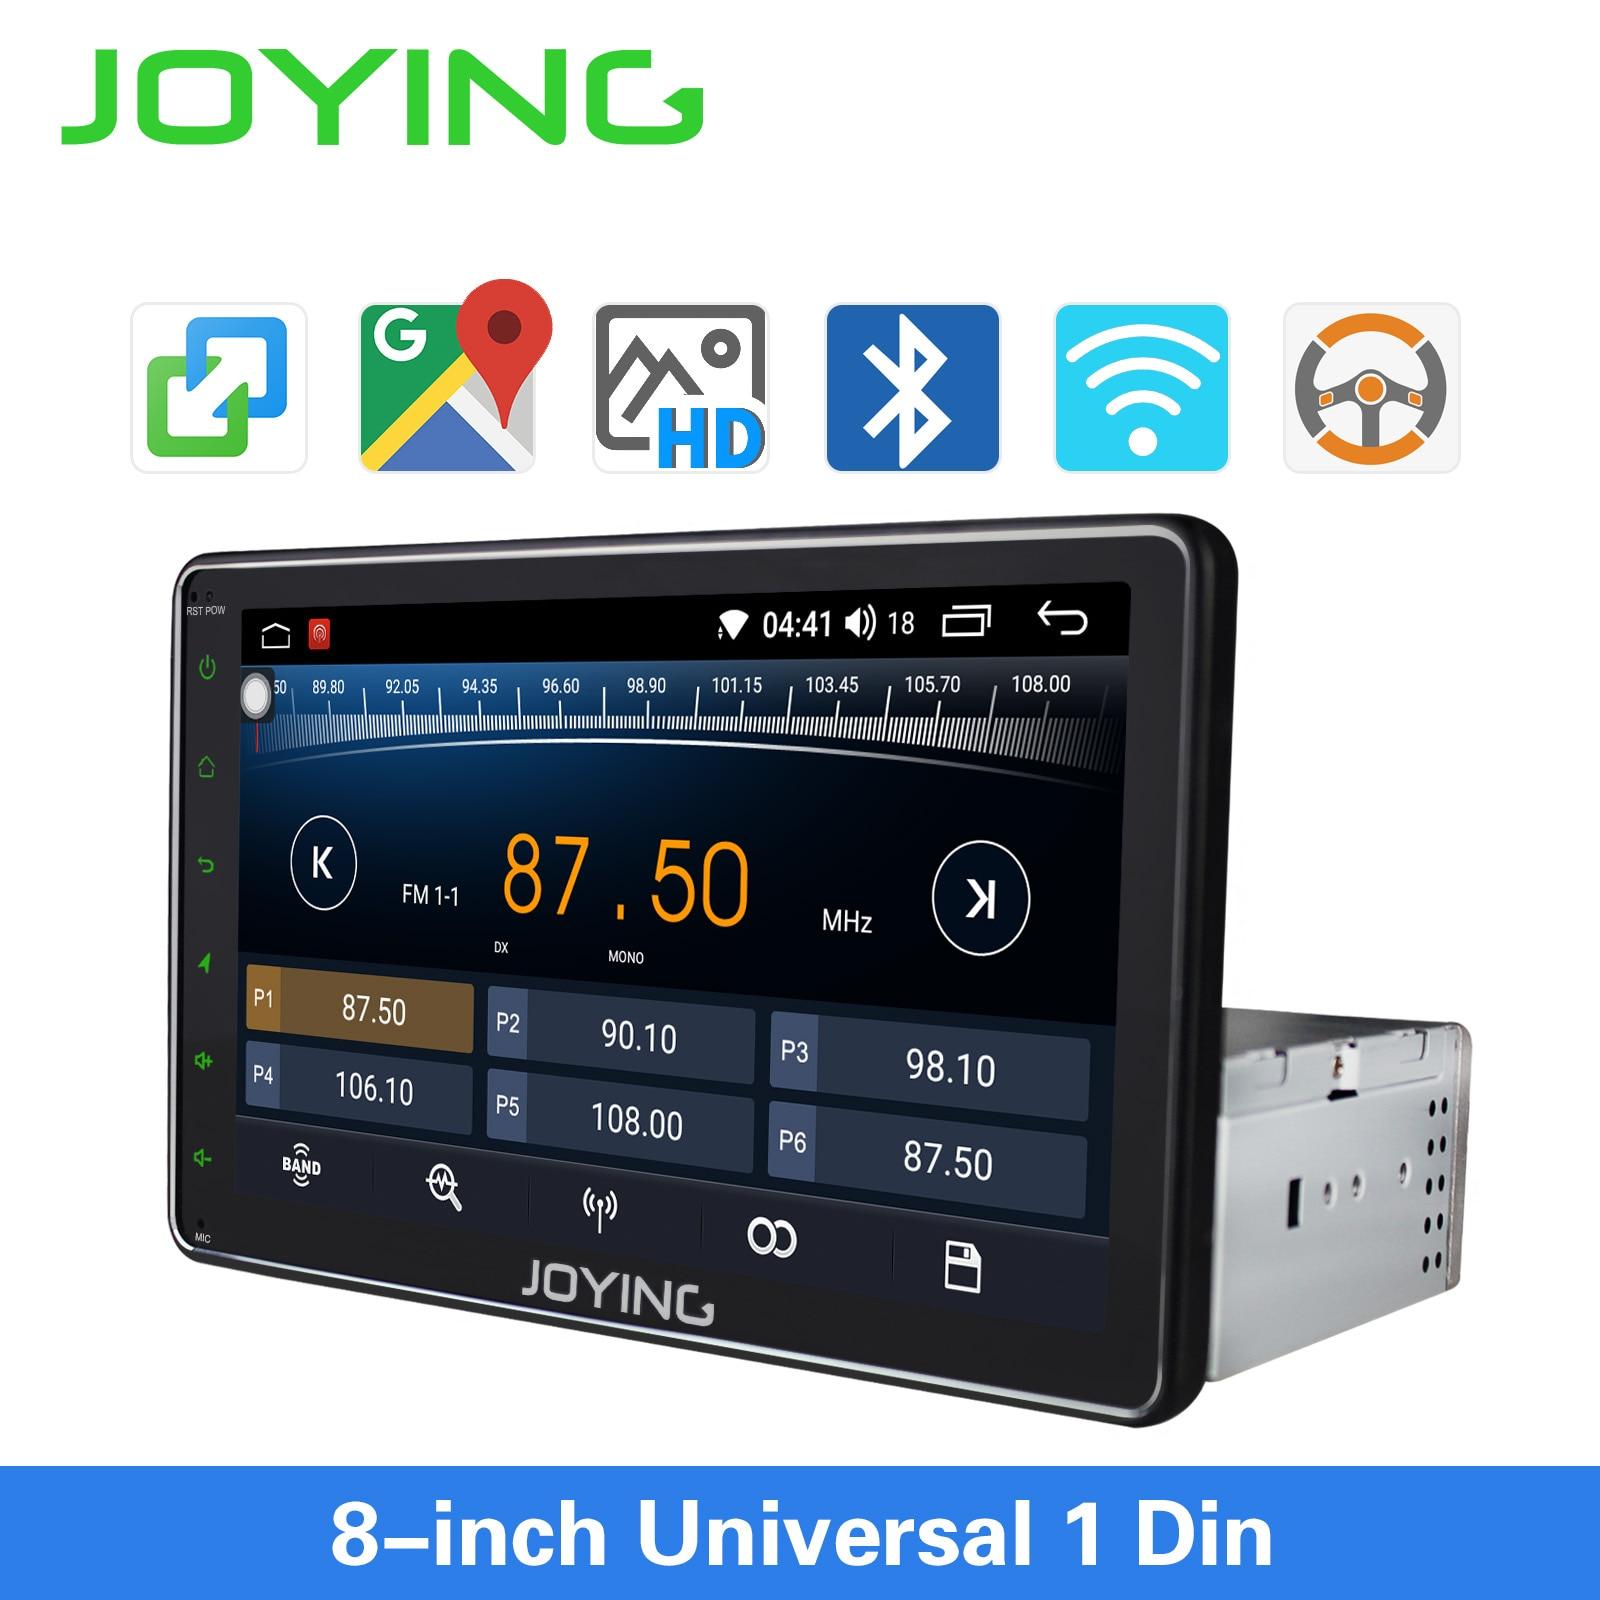 JOYING single din universal car radio 8 inch IPS screen autoradio head unit GPS suport mirror link& fast boot&s*back up cameraCar Multimedia Player   -